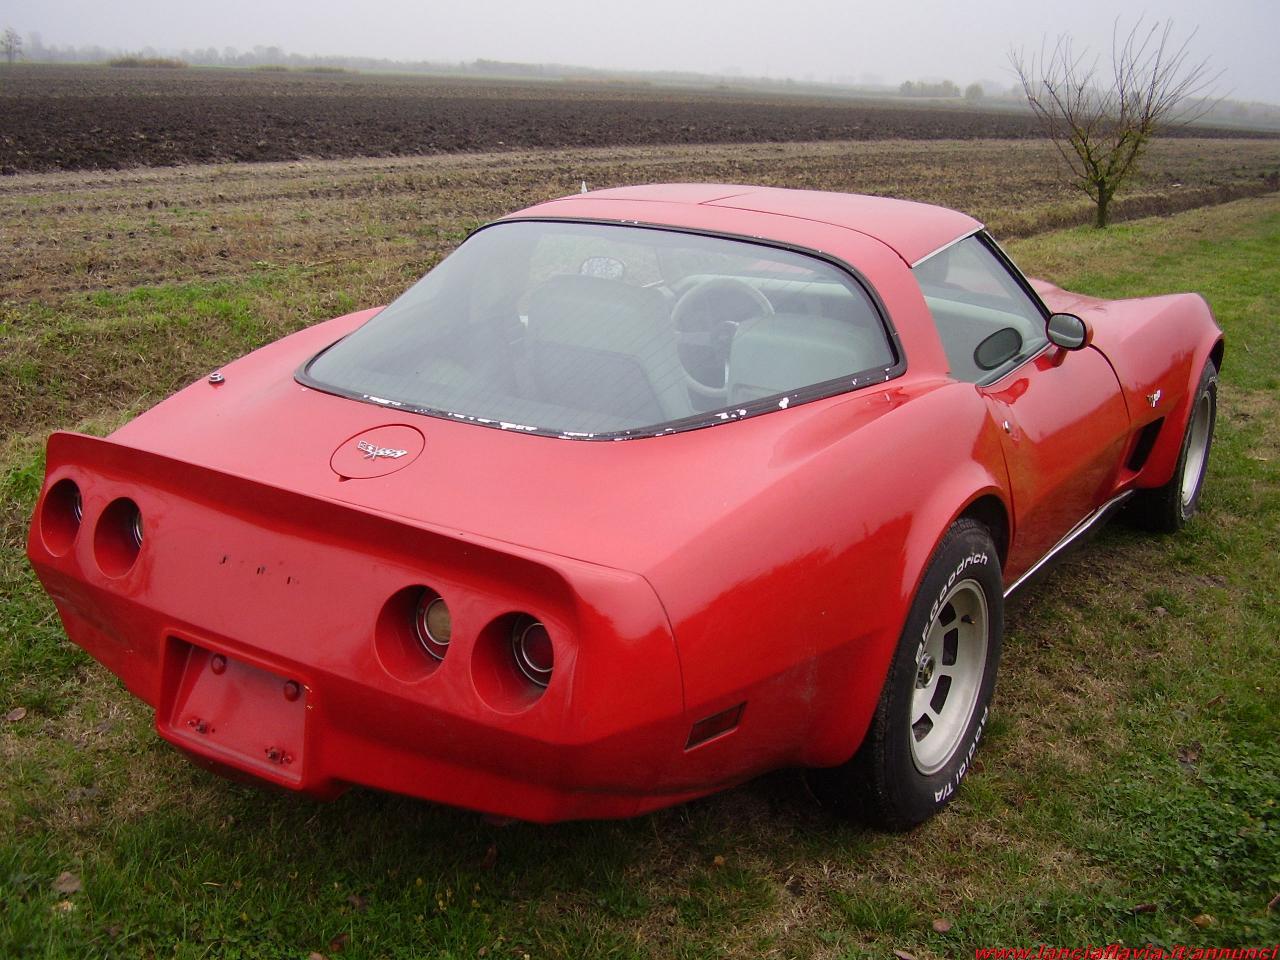 chevrolet corvette c3 stingray oldtimer car the cars. Black Bedroom Furniture Sets. Home Design Ideas